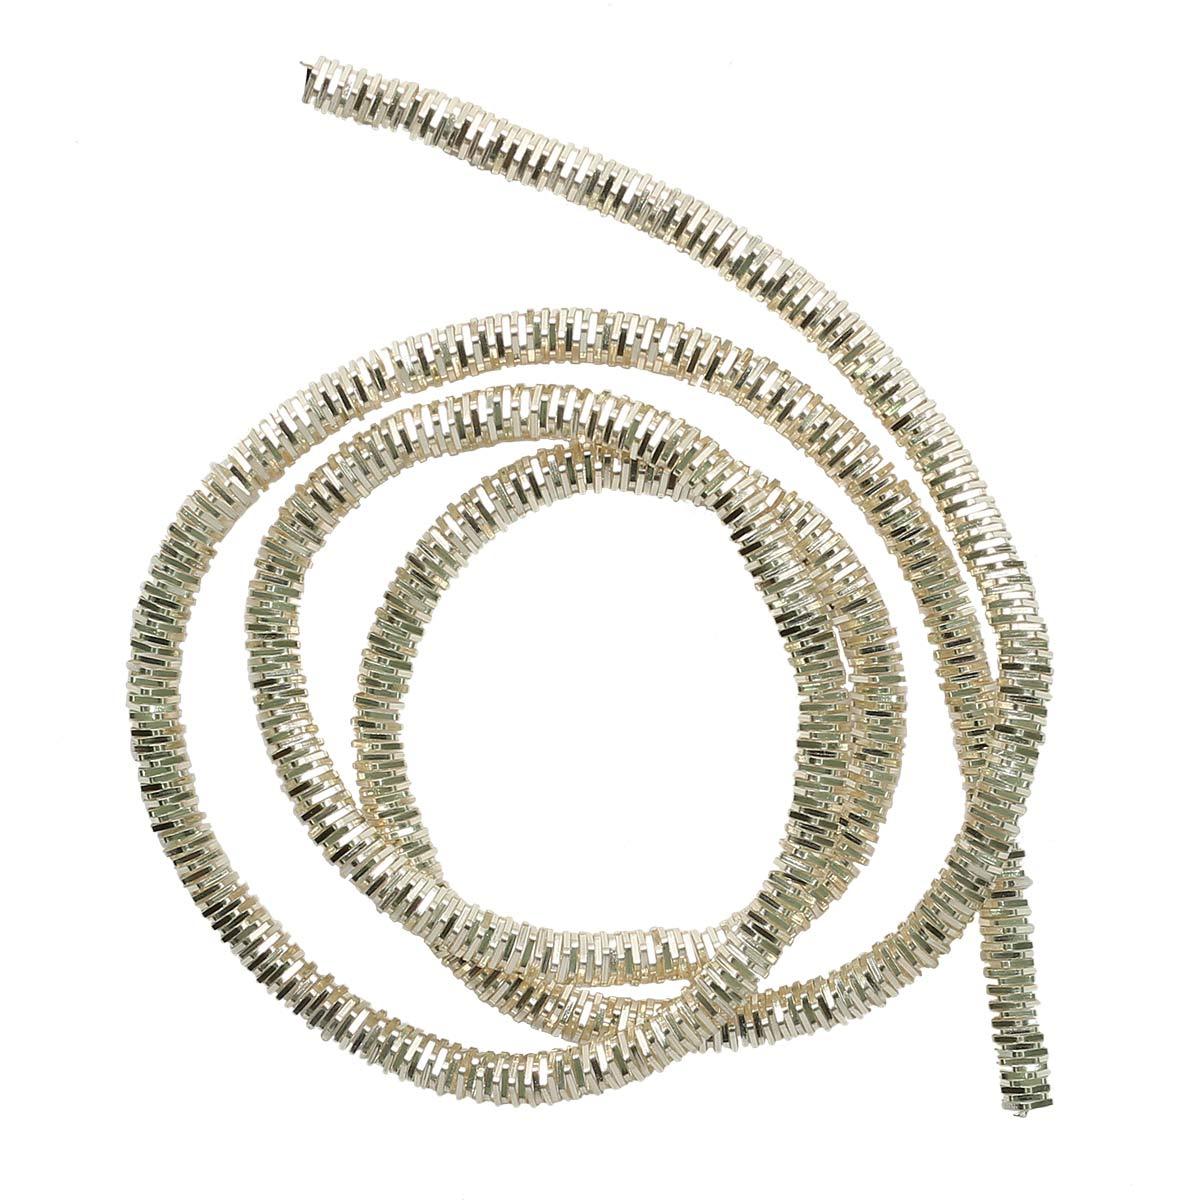 ТК003НН3 Трунцал медный, антич.серебро 3,0 мм, 5 гр/упак Астра